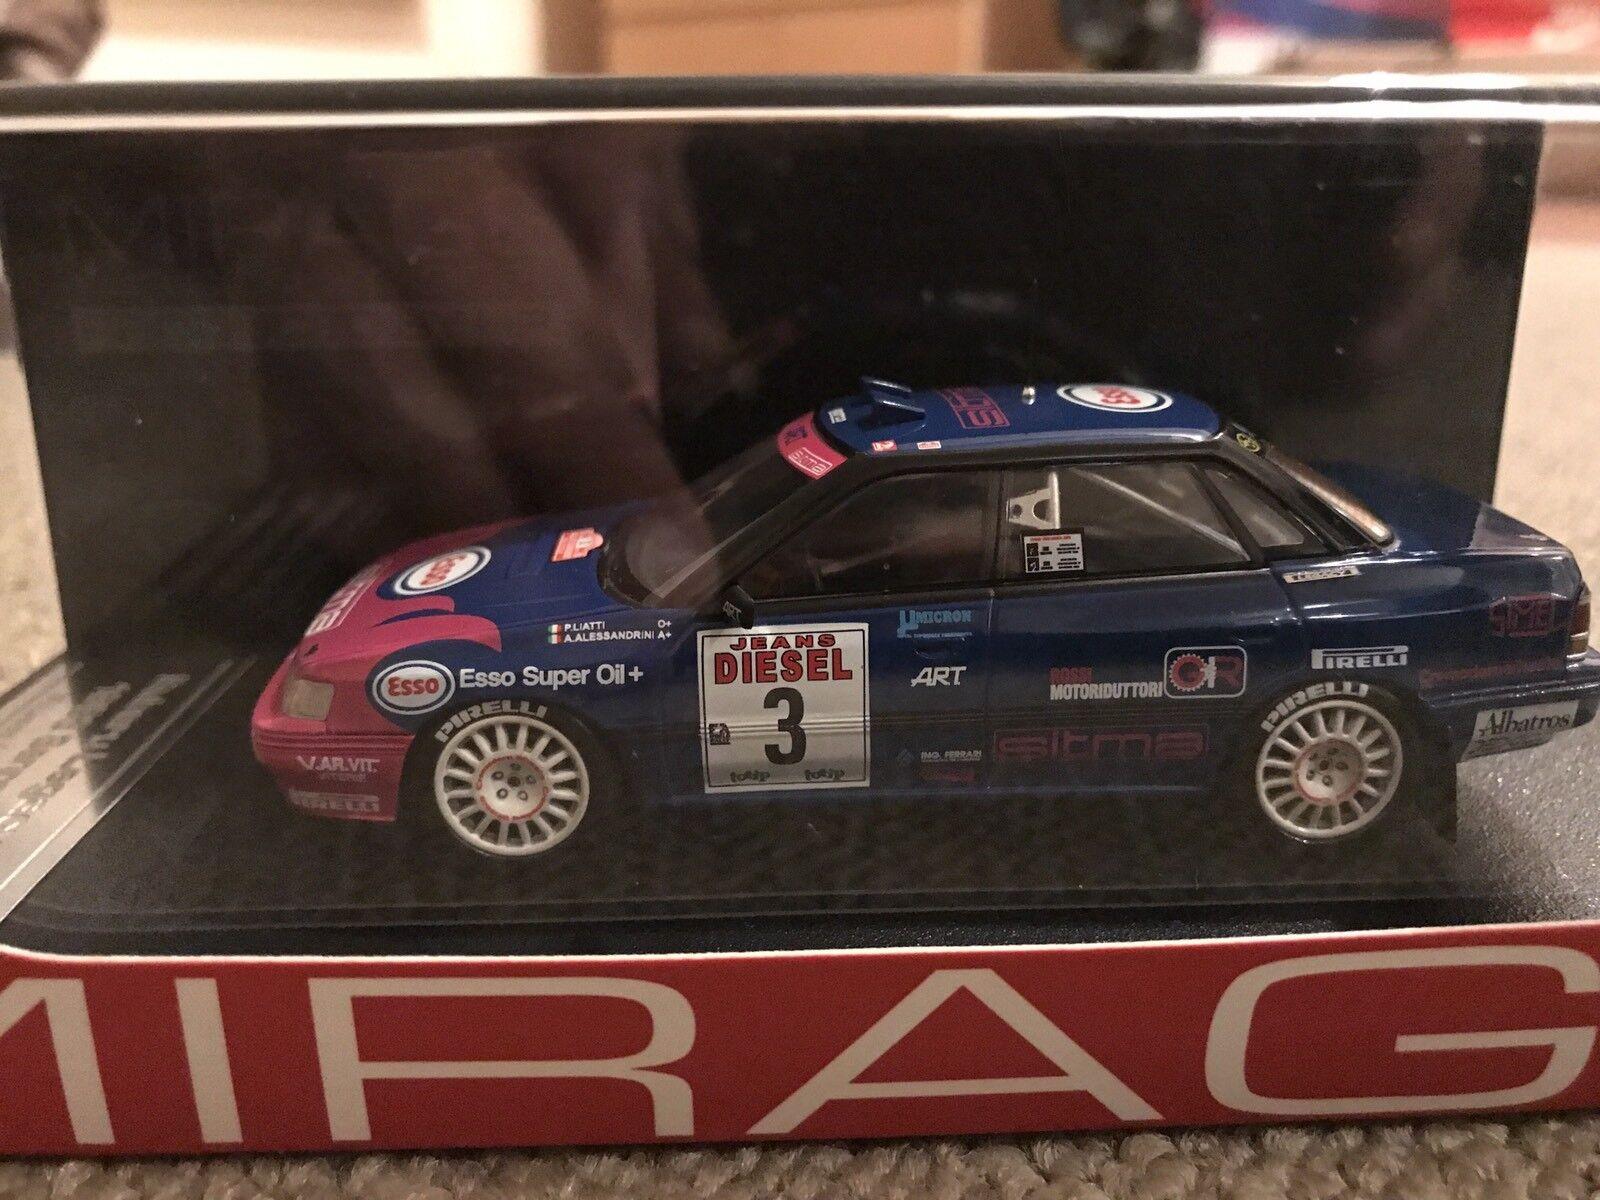 RARE Subaru Legacy RS  3 1993 San Remo Rally HPI  8271 1 43 STI WRX WRC